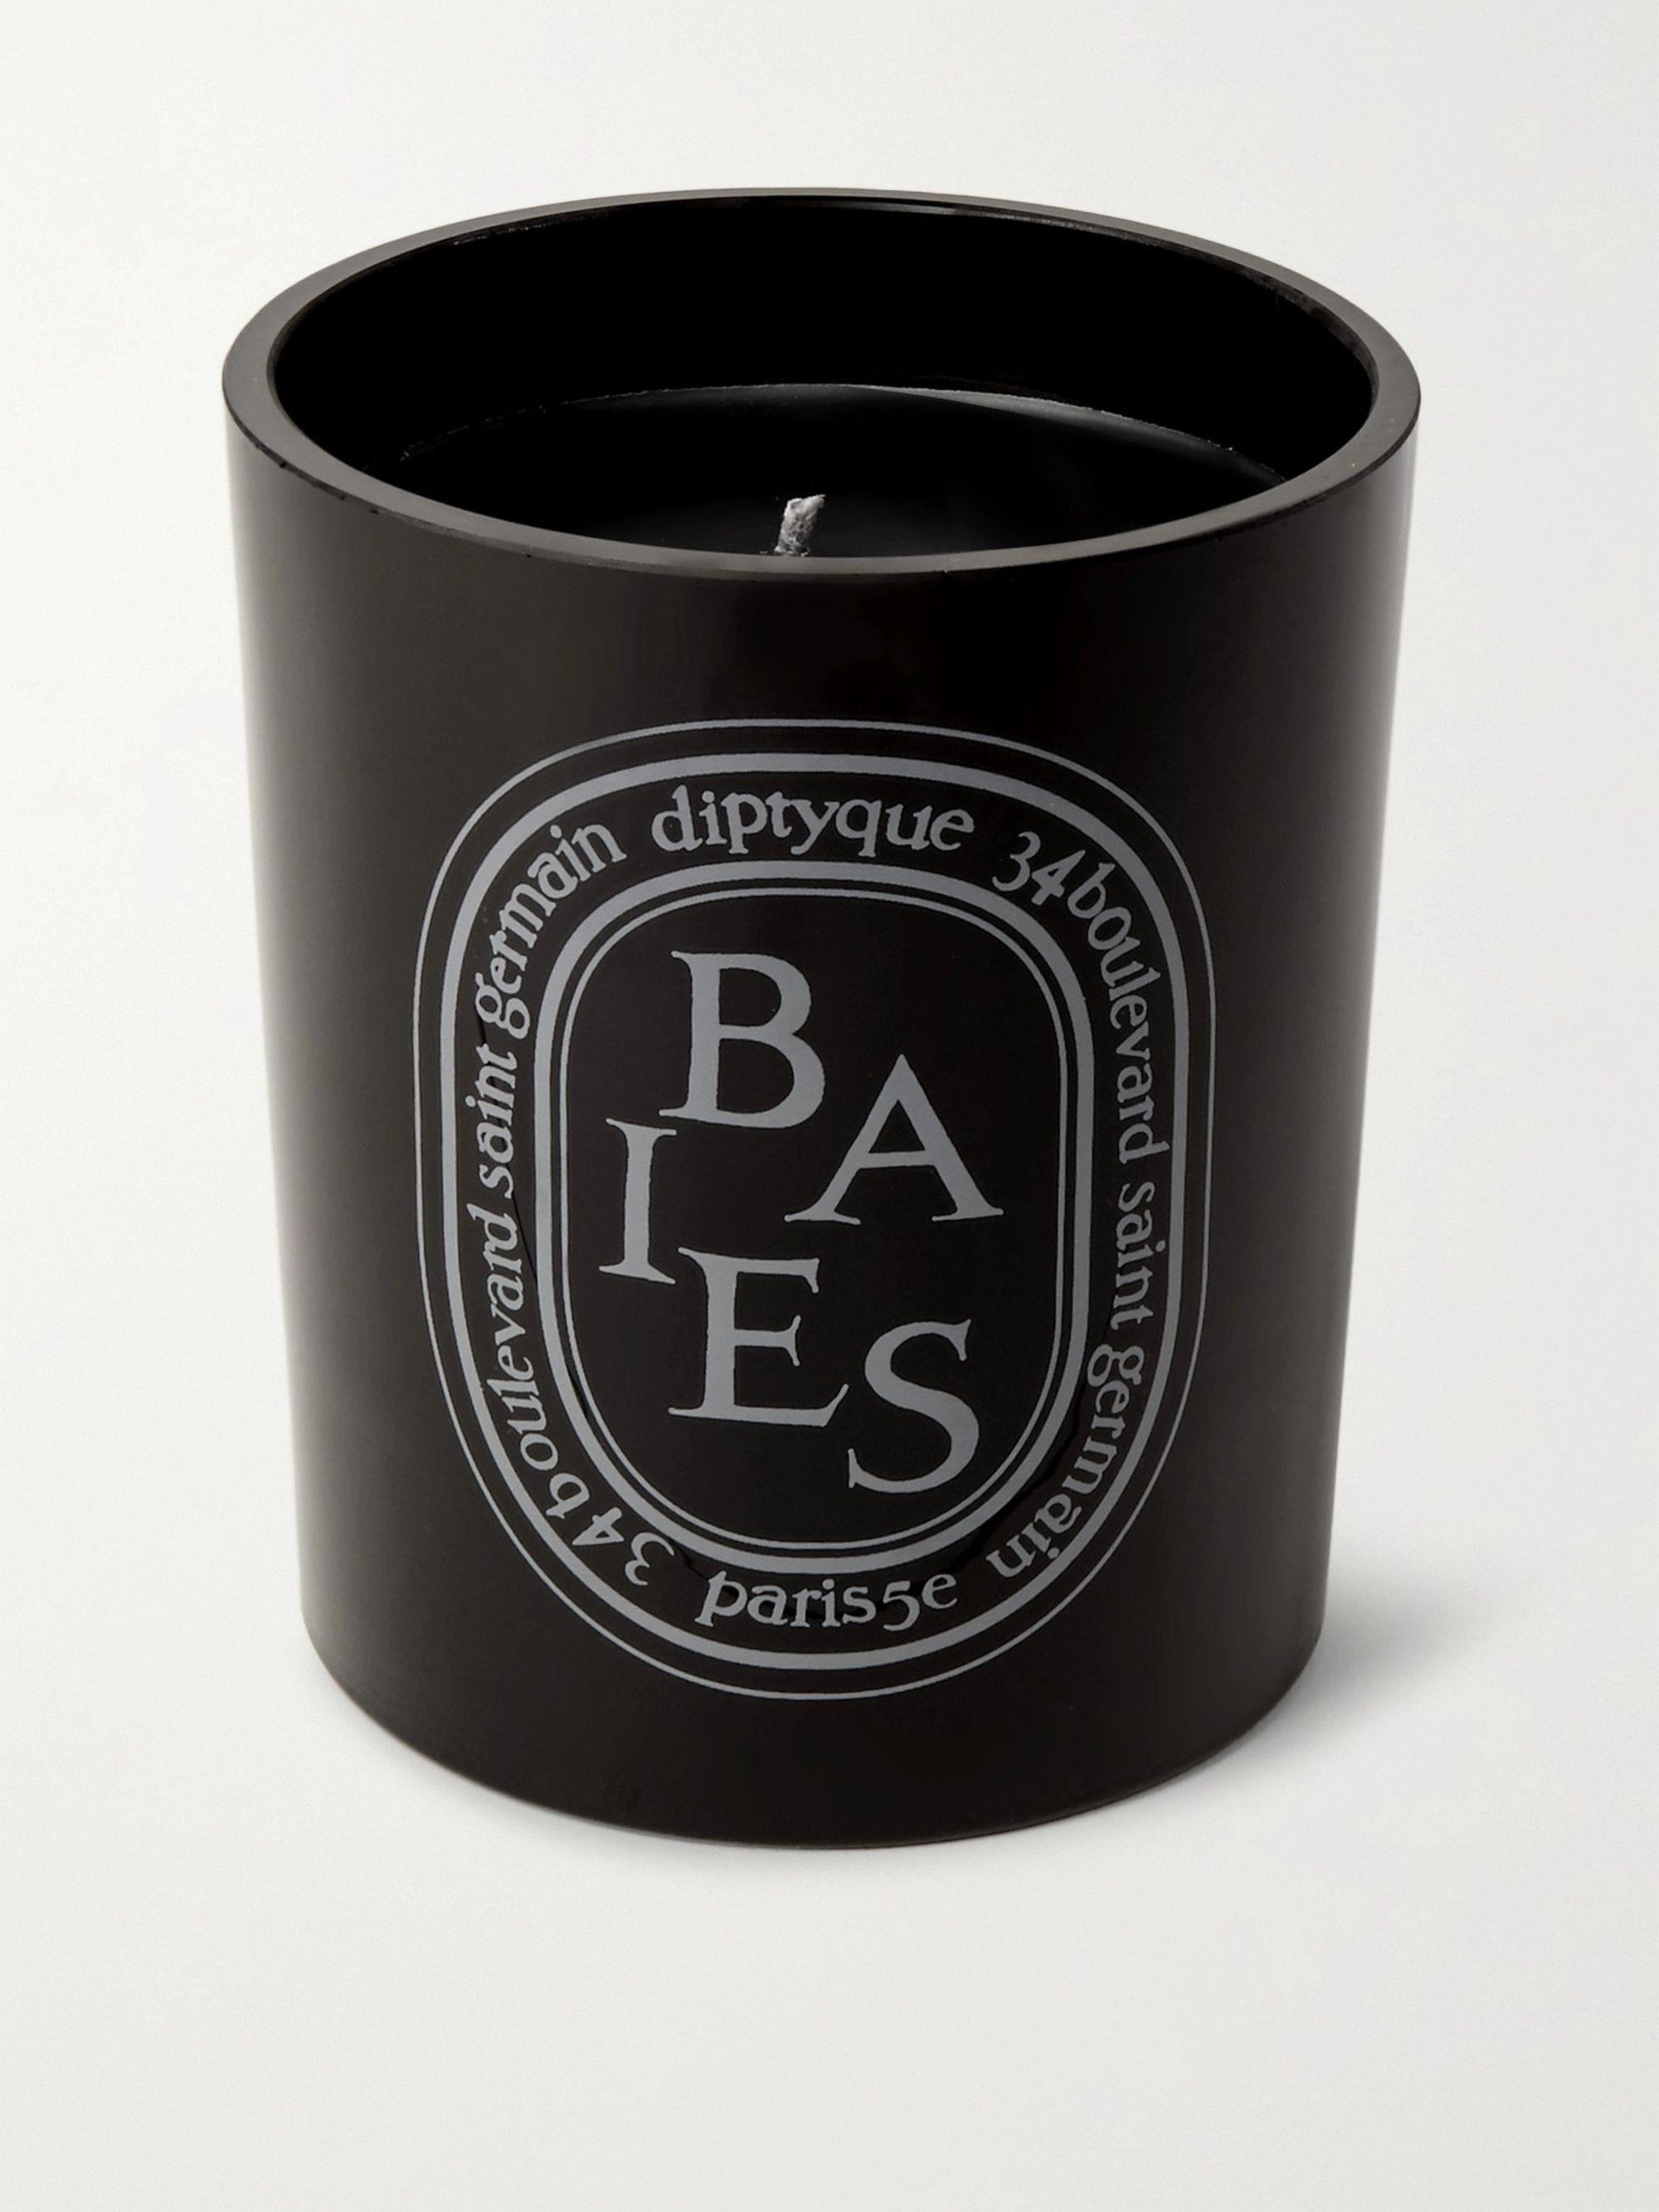 Black Black Baies Scented Candle, 300g | Diptyque | MR PORTER